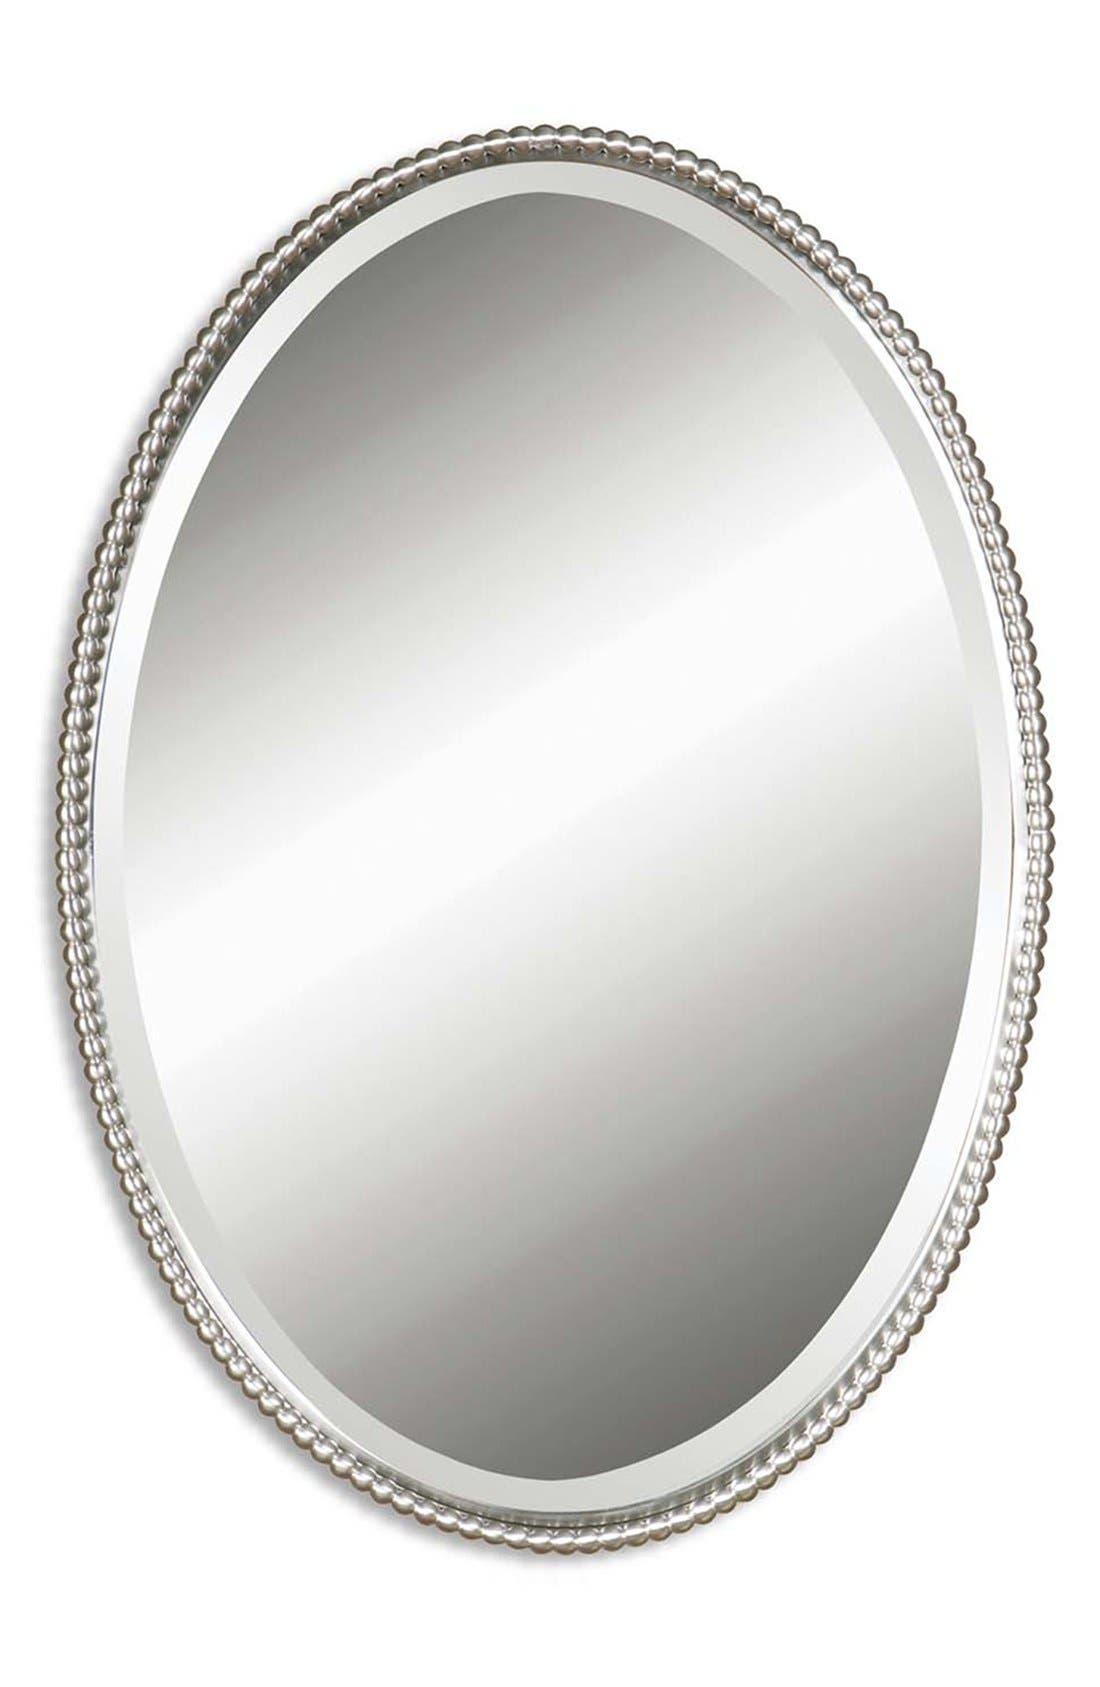 'Sherise' Oval Mirror,                             Main thumbnail 1, color,                             040